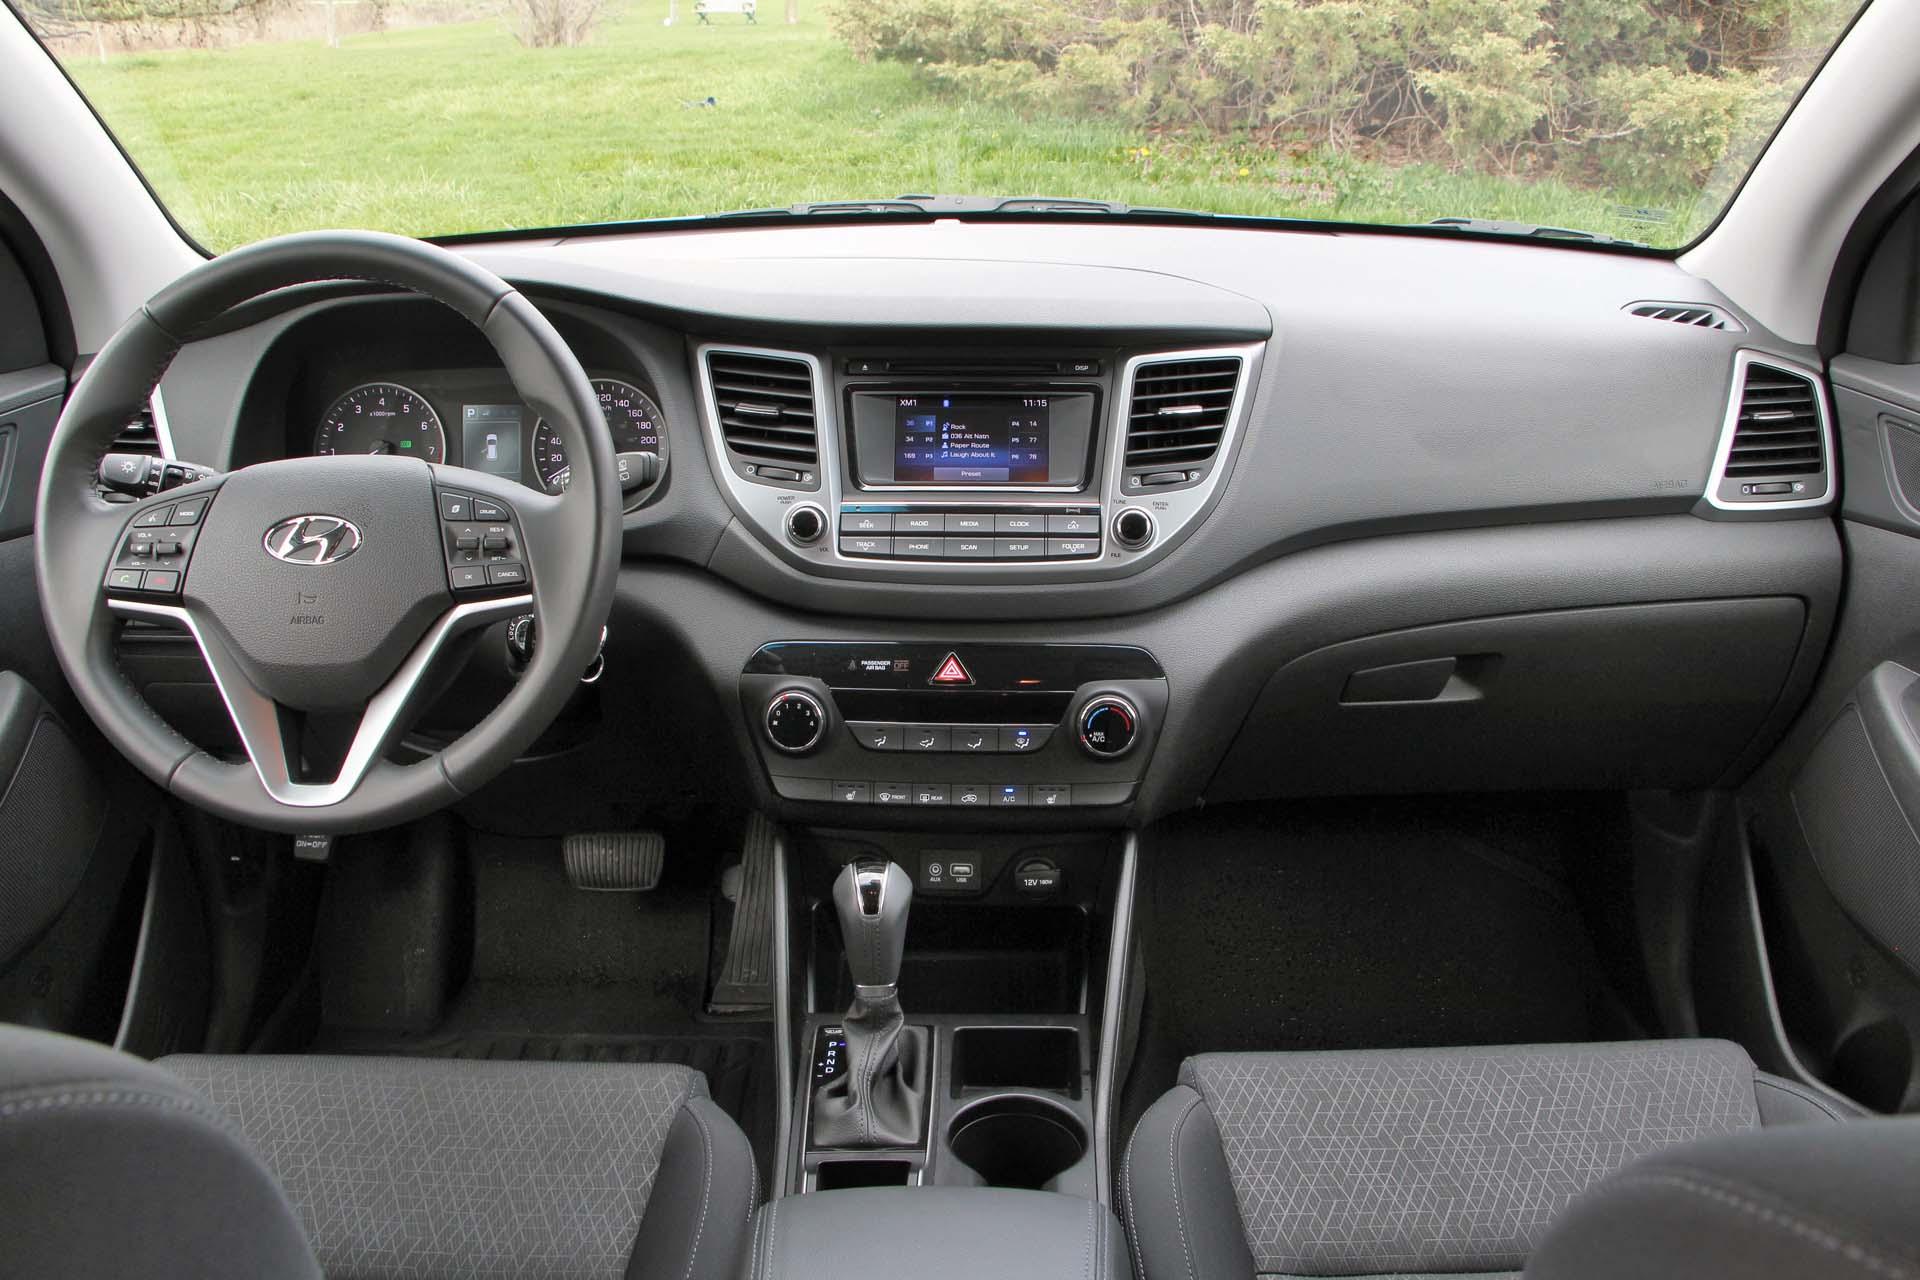 info hyundai driver reviews review official photo photos tucson news original fwd test car and s